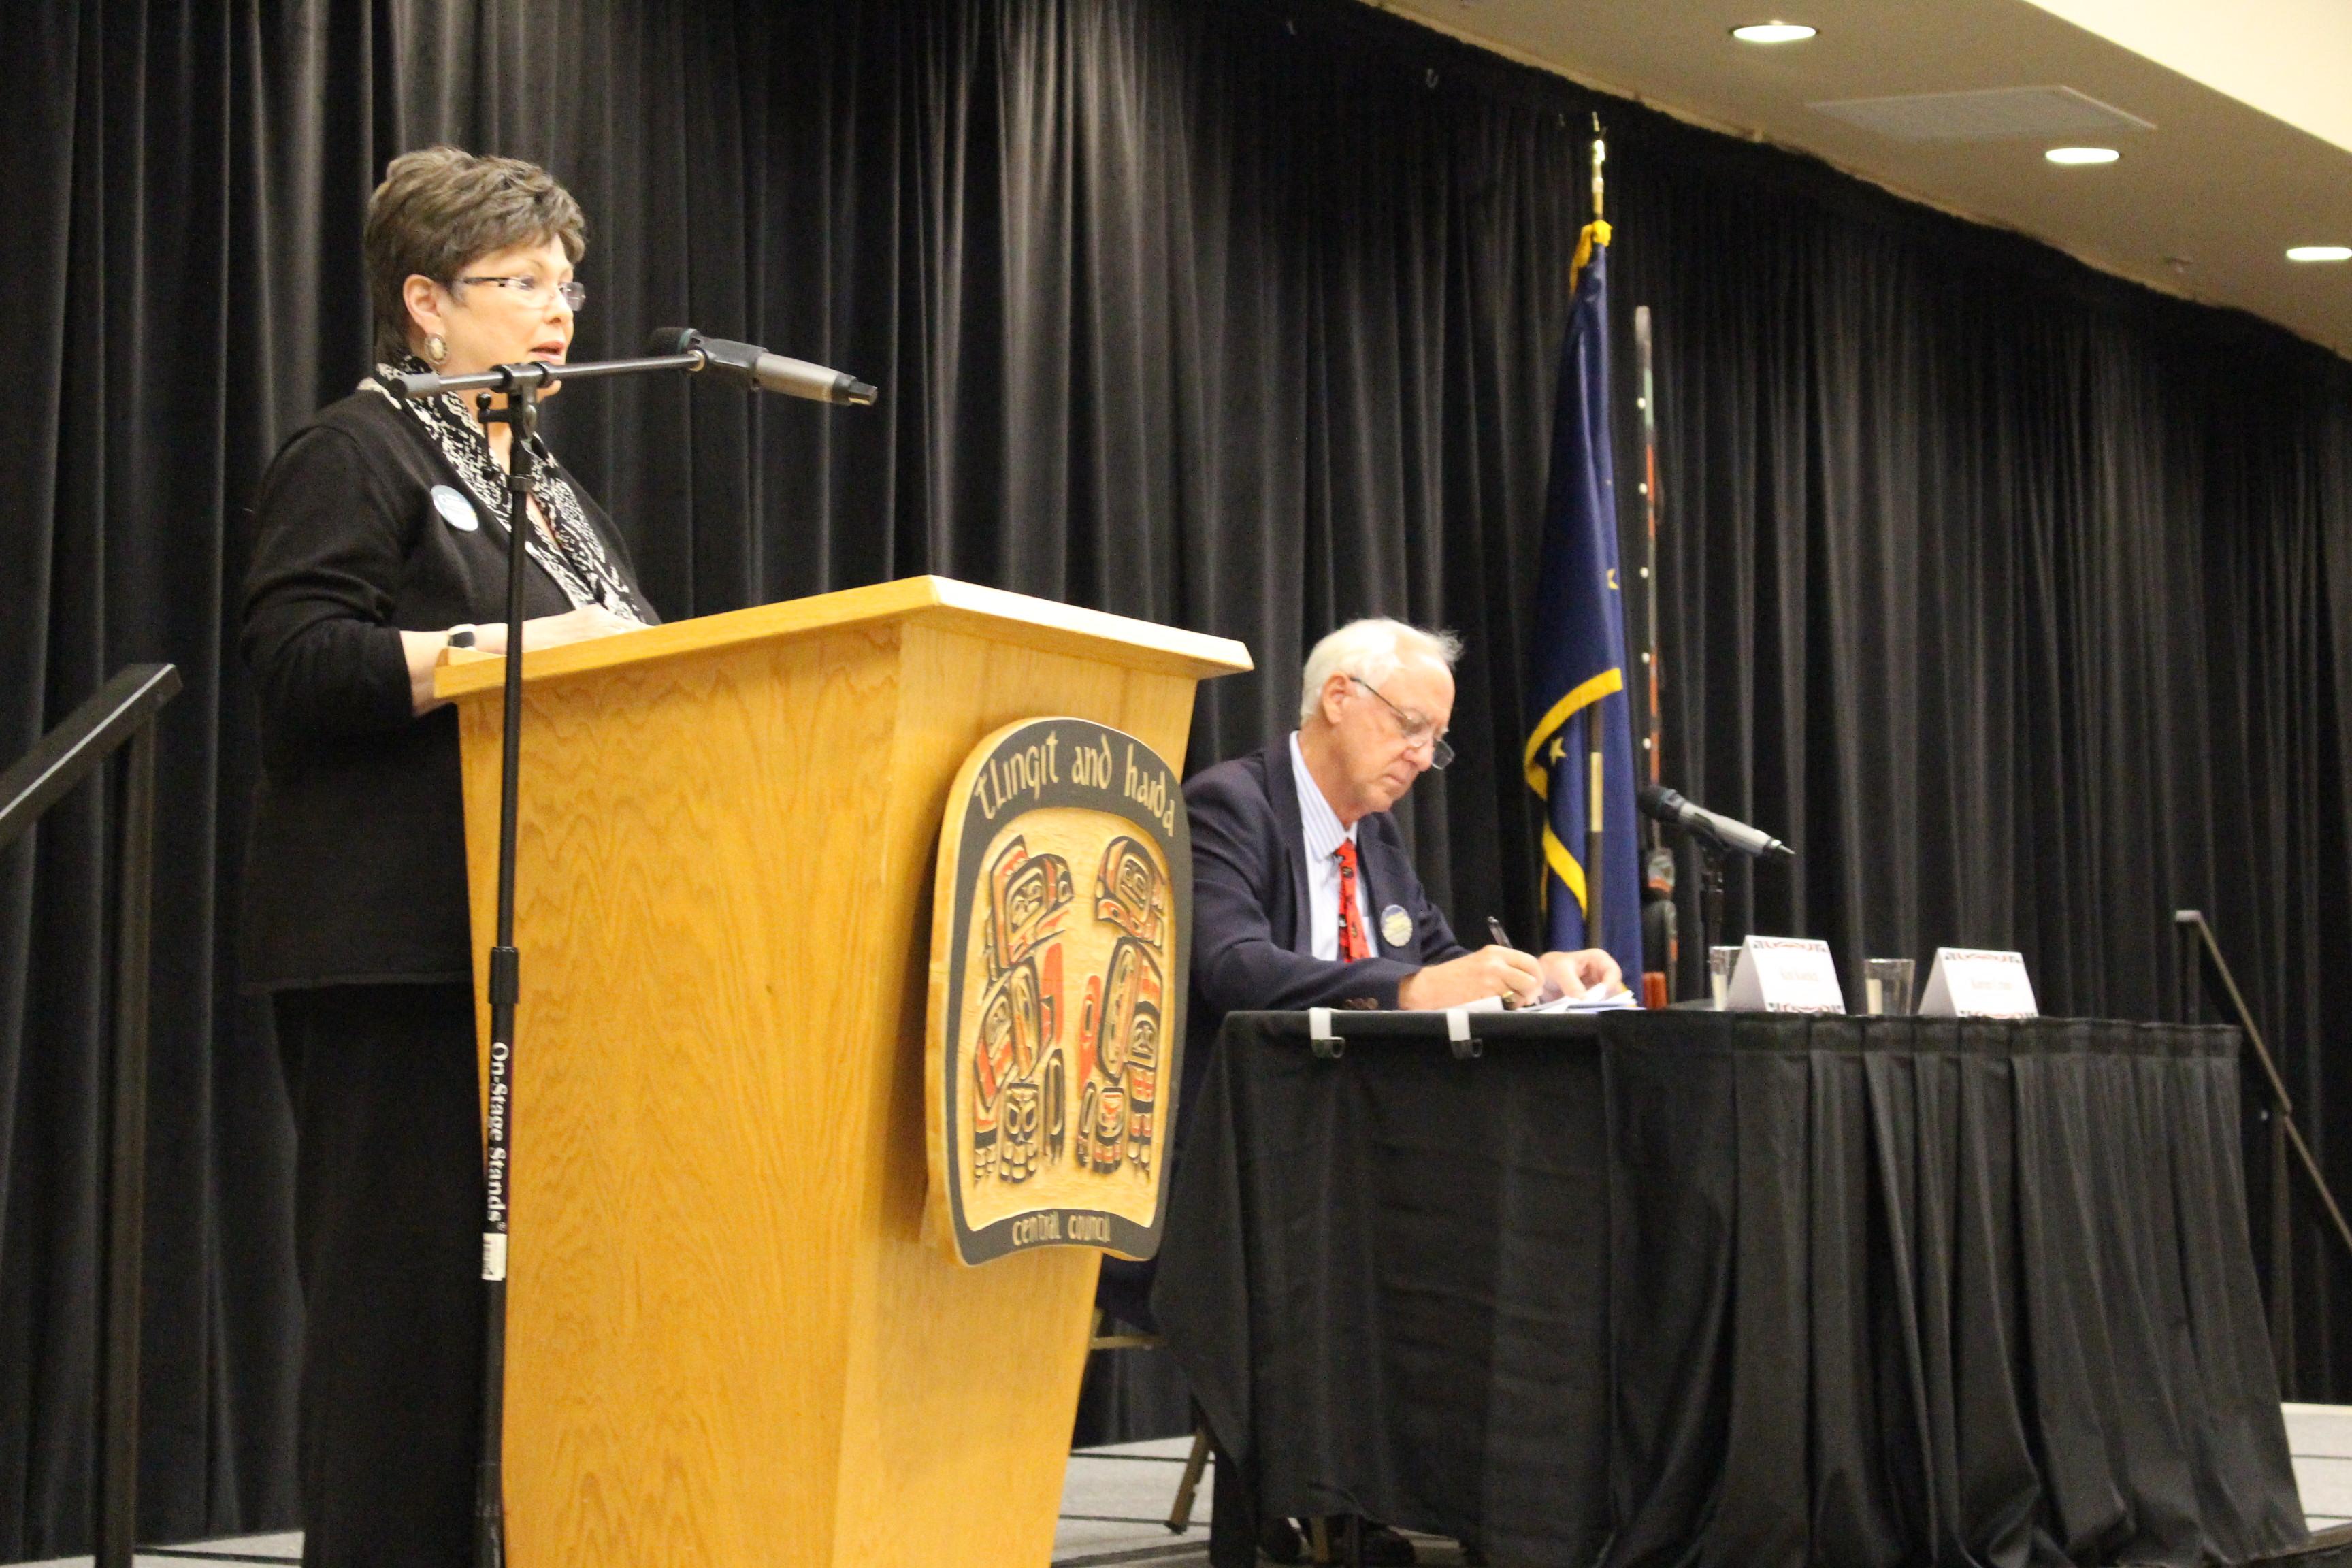 Mayoral candidate Karen Crane and Ken Koelsch spoke at the Native Issues Forum. (Photo by Elizabeth Jenkins/KTOO)